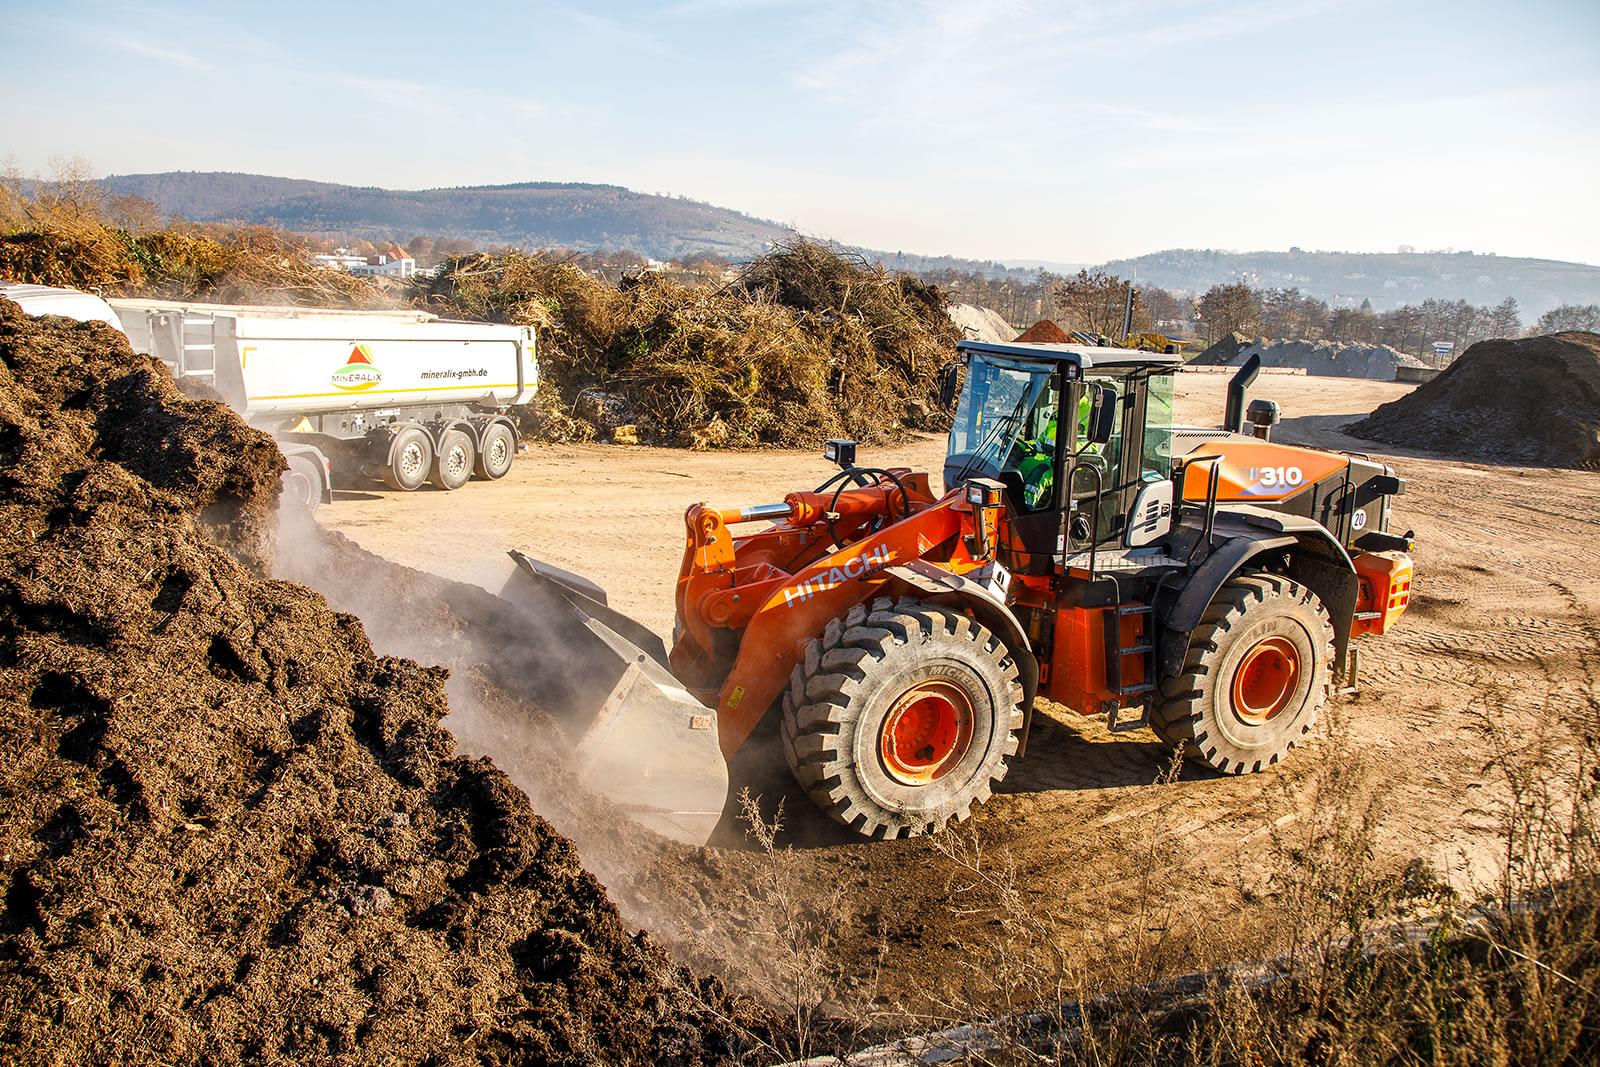 Hitachi ZW310-6 wheel loader loading materials for MinERALix